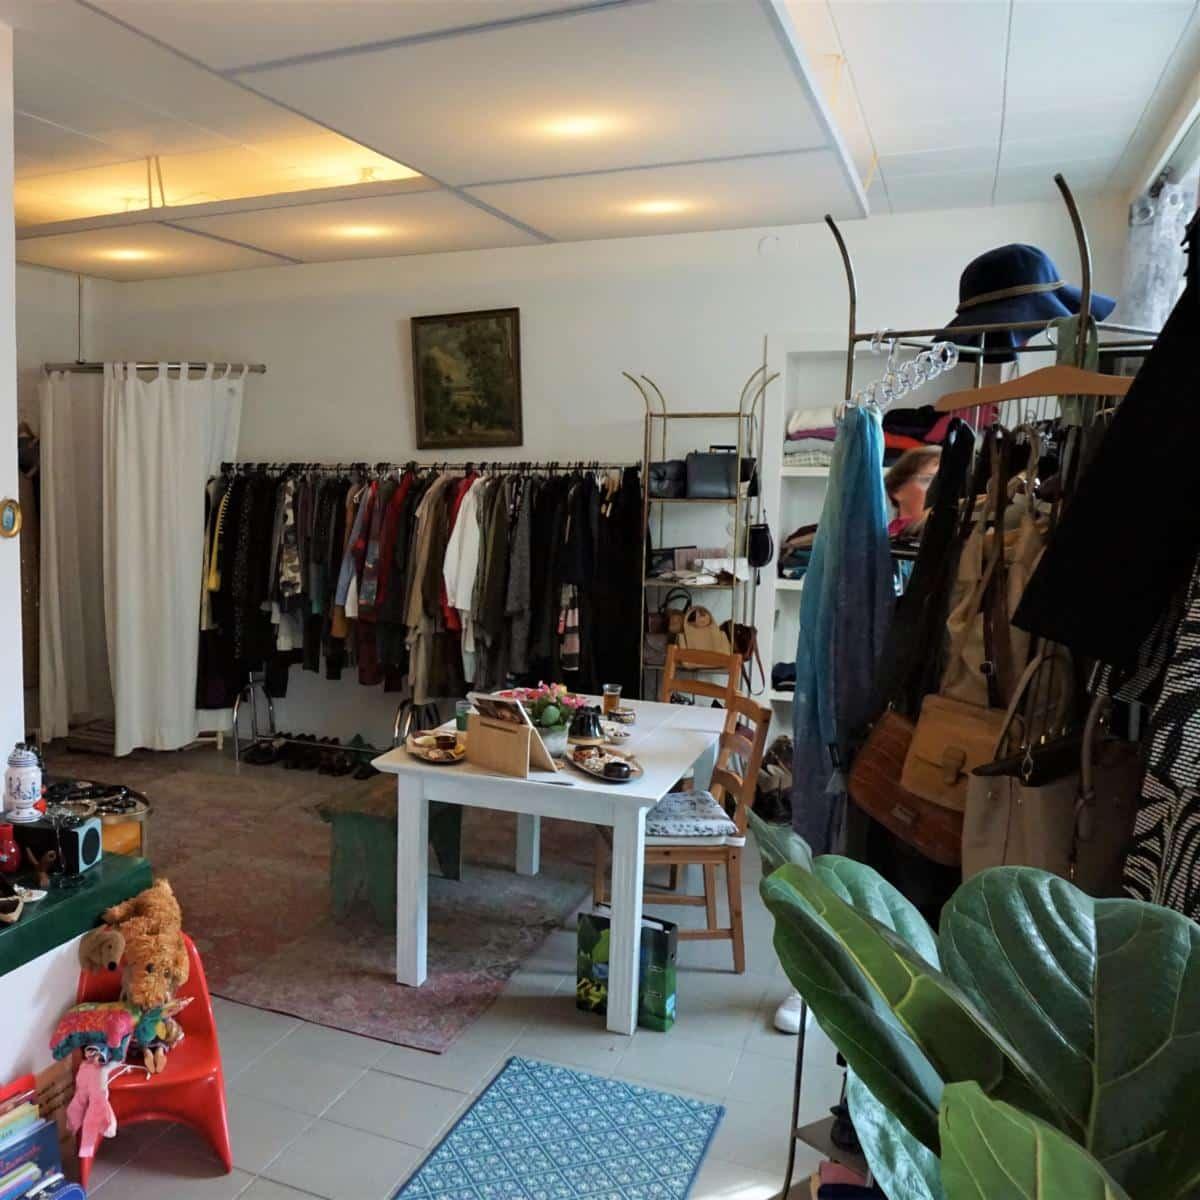 Style Hannover Vita Keppel 4 - Vita Keppel: Hier können KundInnen kaufen – und verkaufen